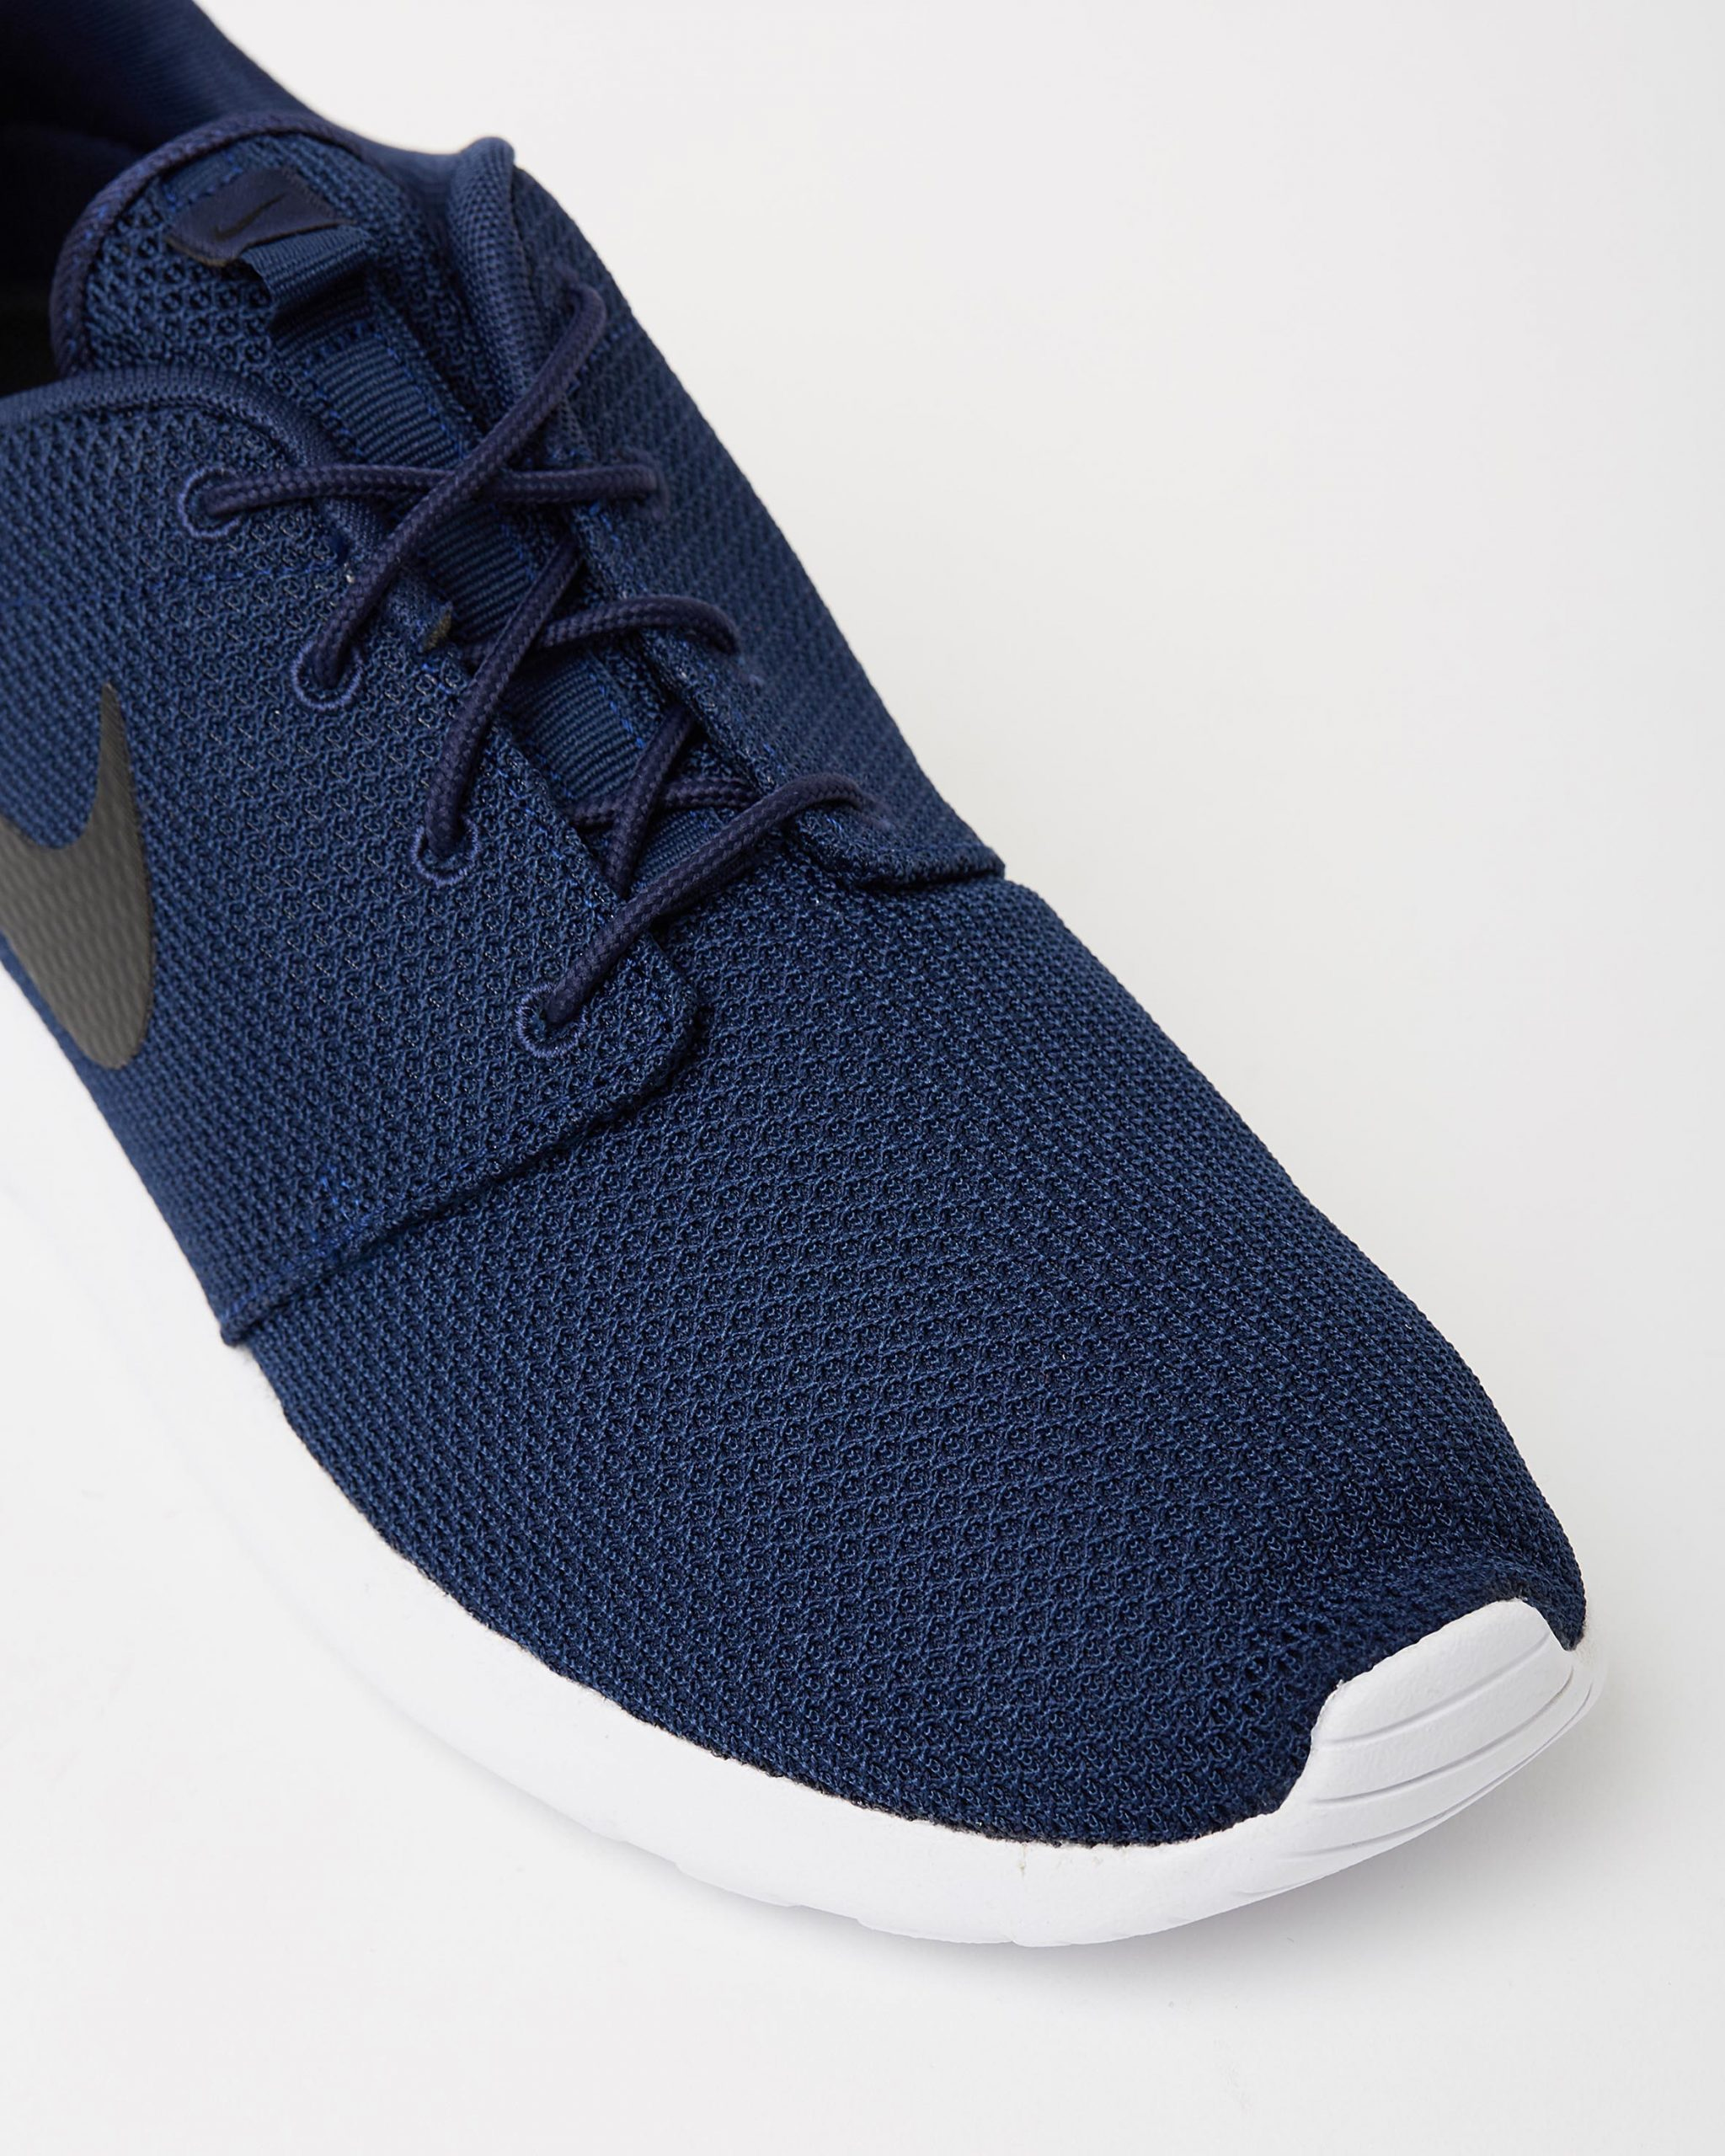 Nike Mens Roshe One Midnight Navy/Black